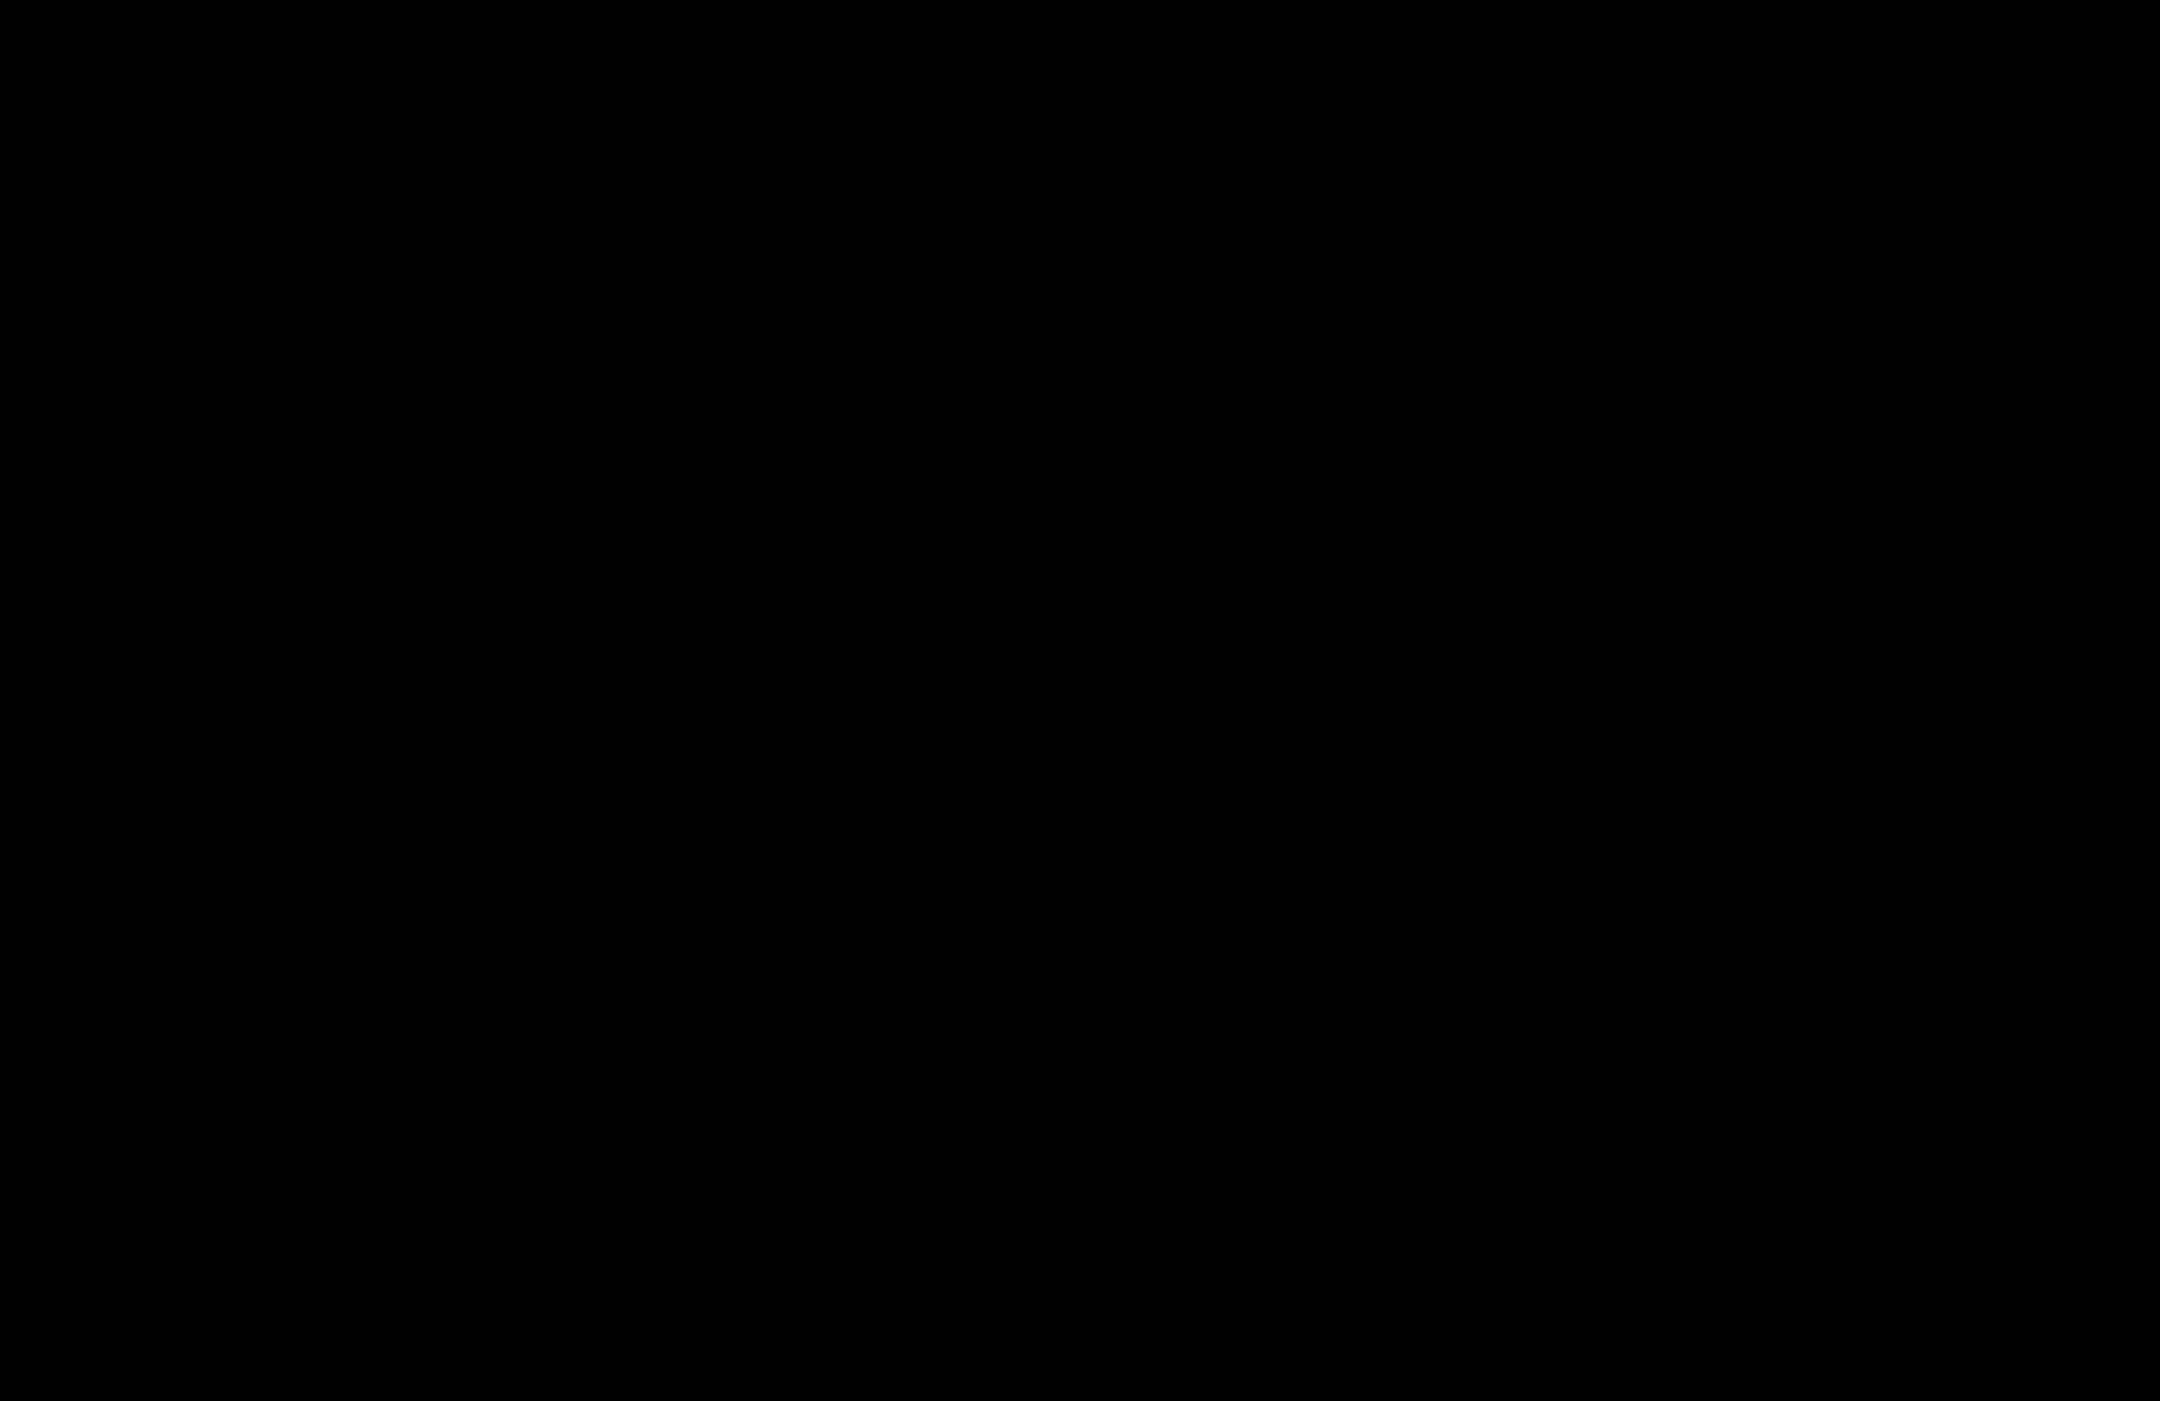 umbro logo 1 1 - Umbro Logo